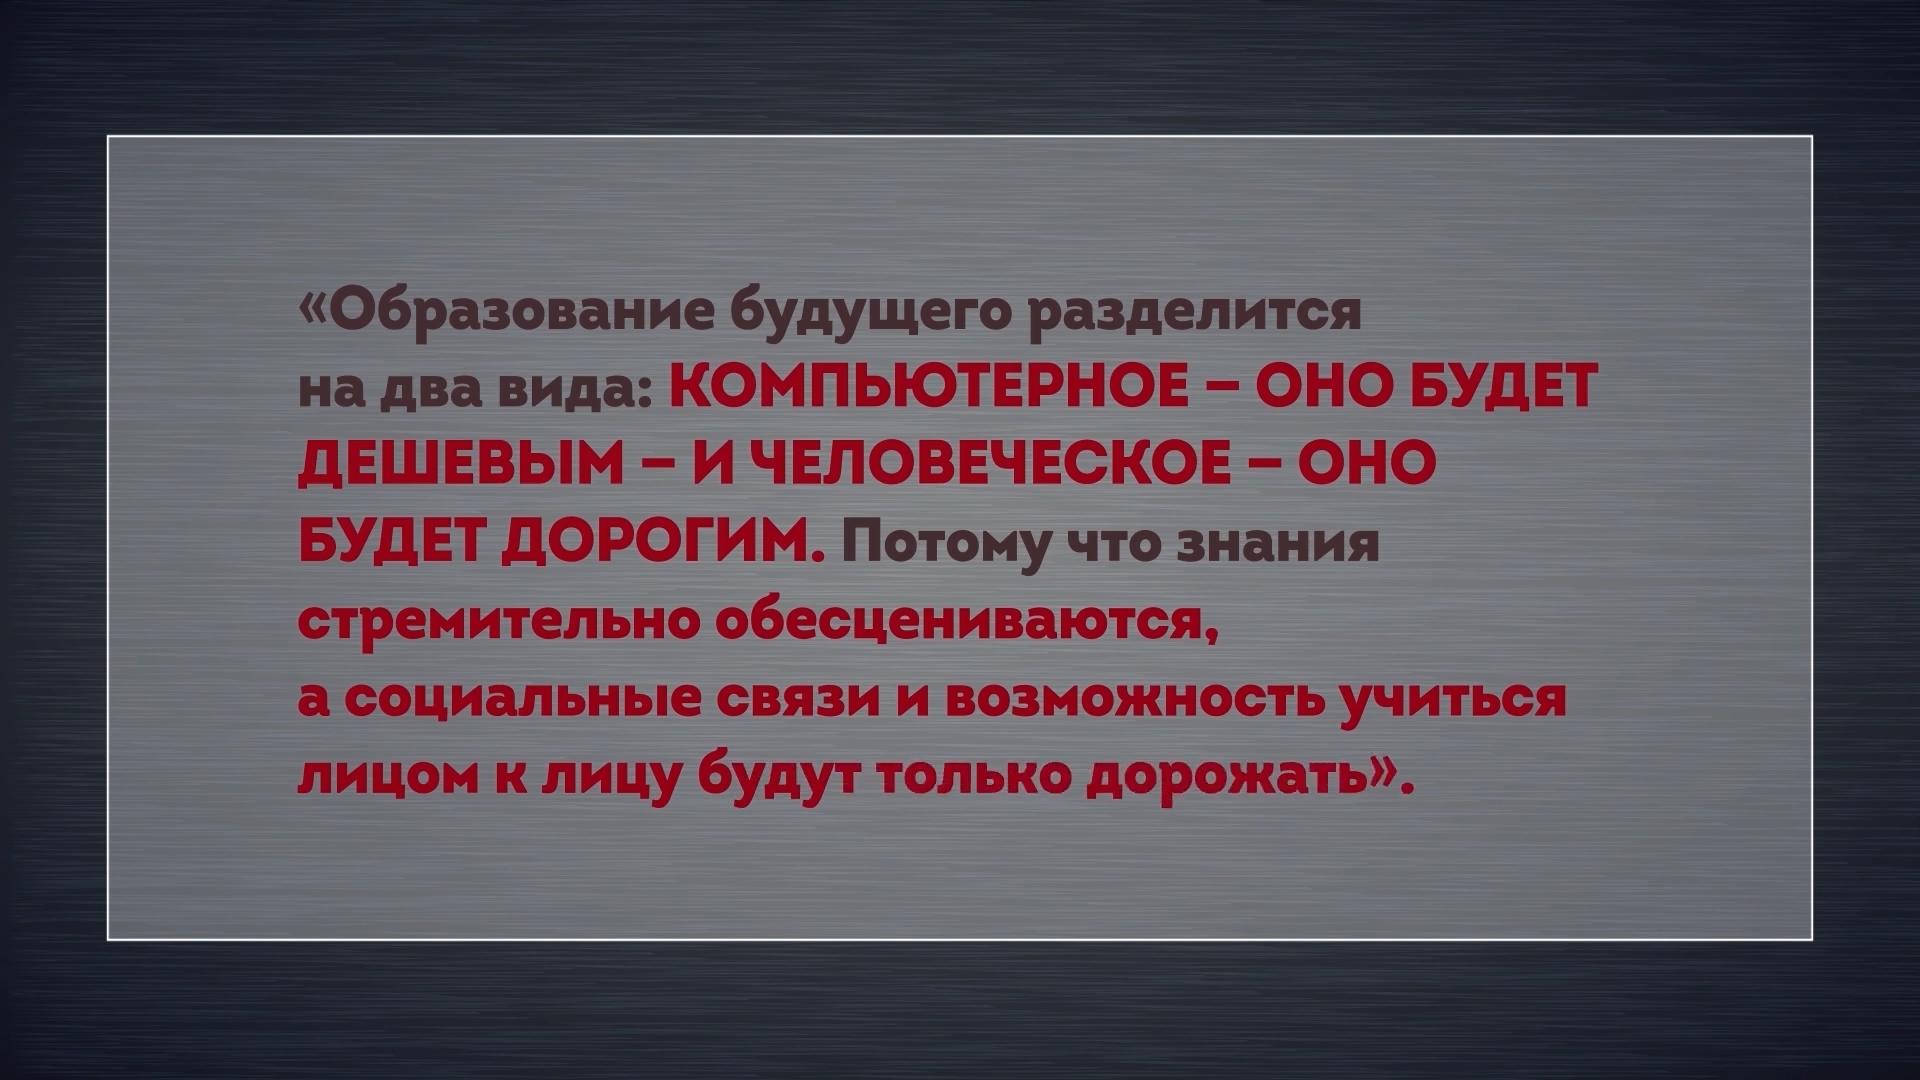 20200501-БесогонTV «У кого в кармане государство»-pic13